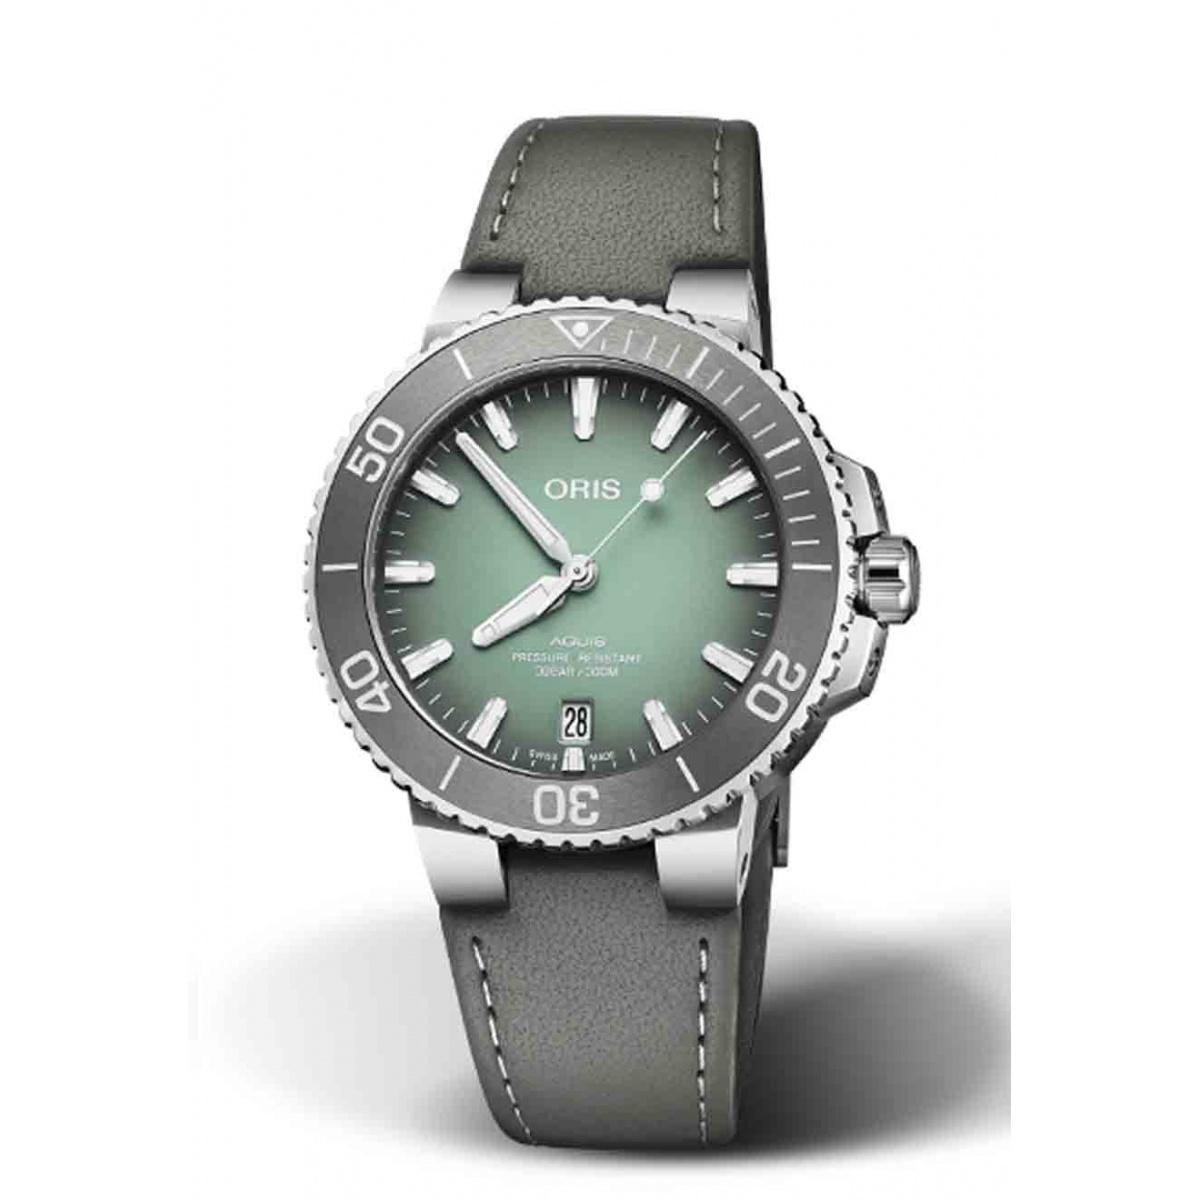 ORIS AQUIS DATE 300 M ∅39,5 mm, Esfera verde, piel gris